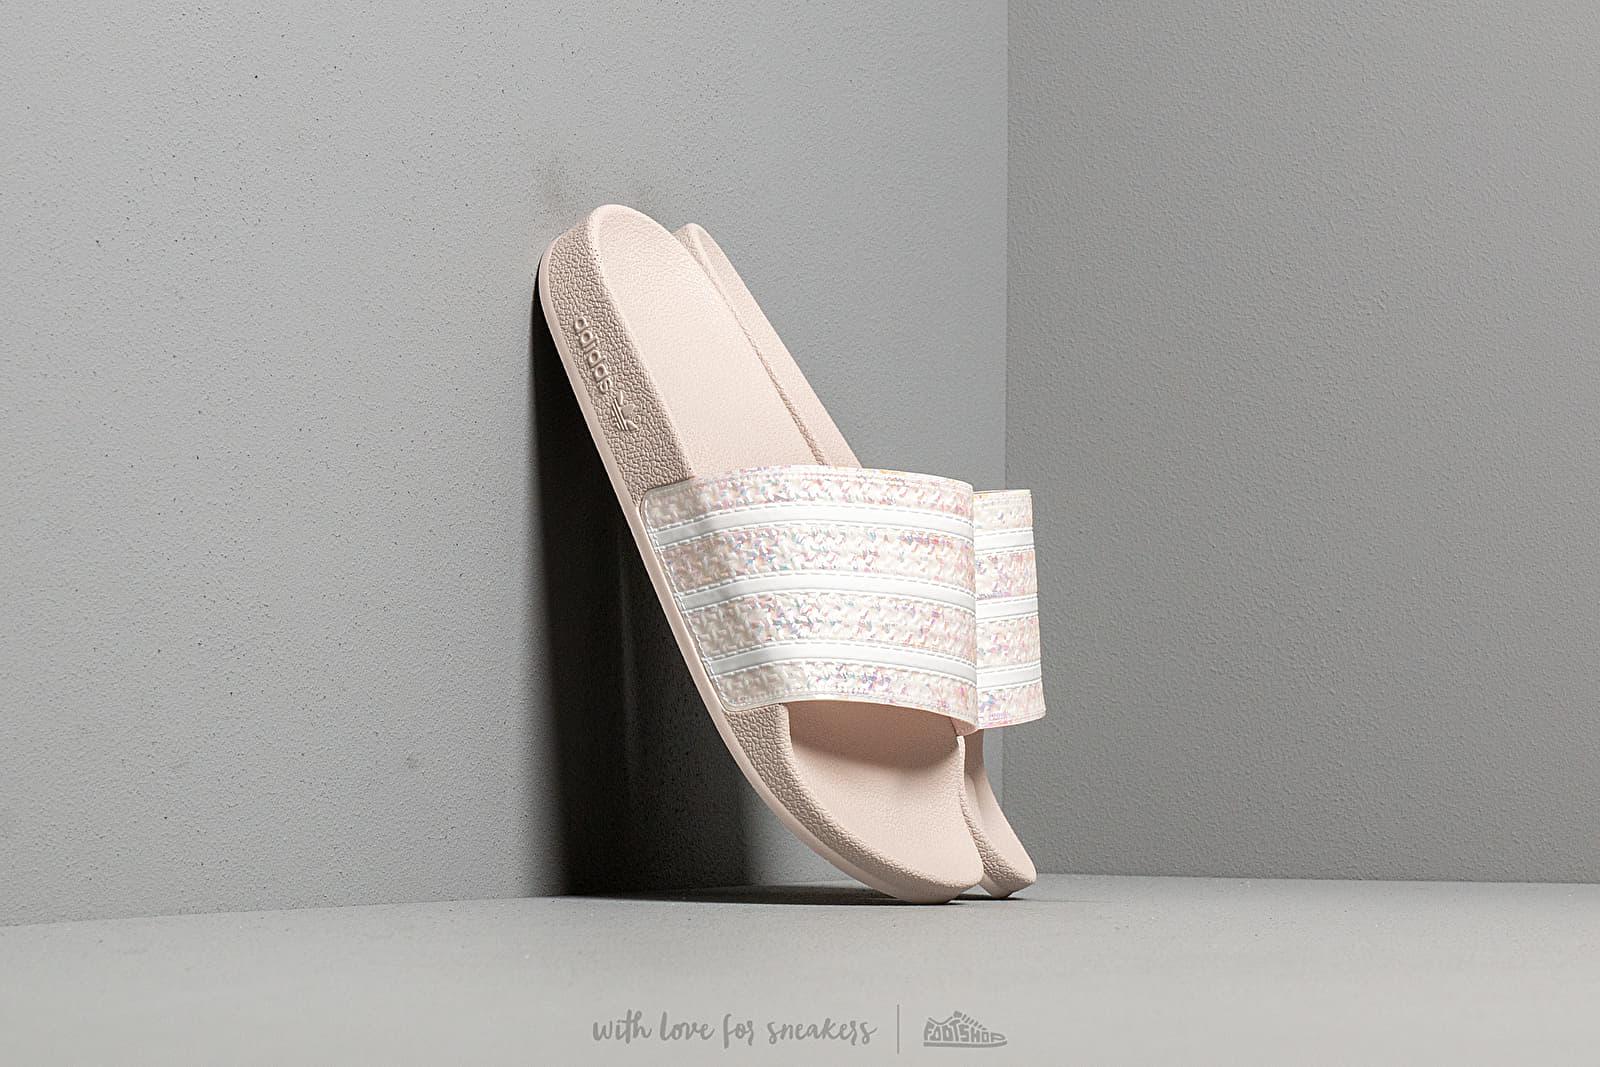 Dámské tenisky a boty adidas Adilette W Orchid Tint/ Ftw White/ Orchid Tint